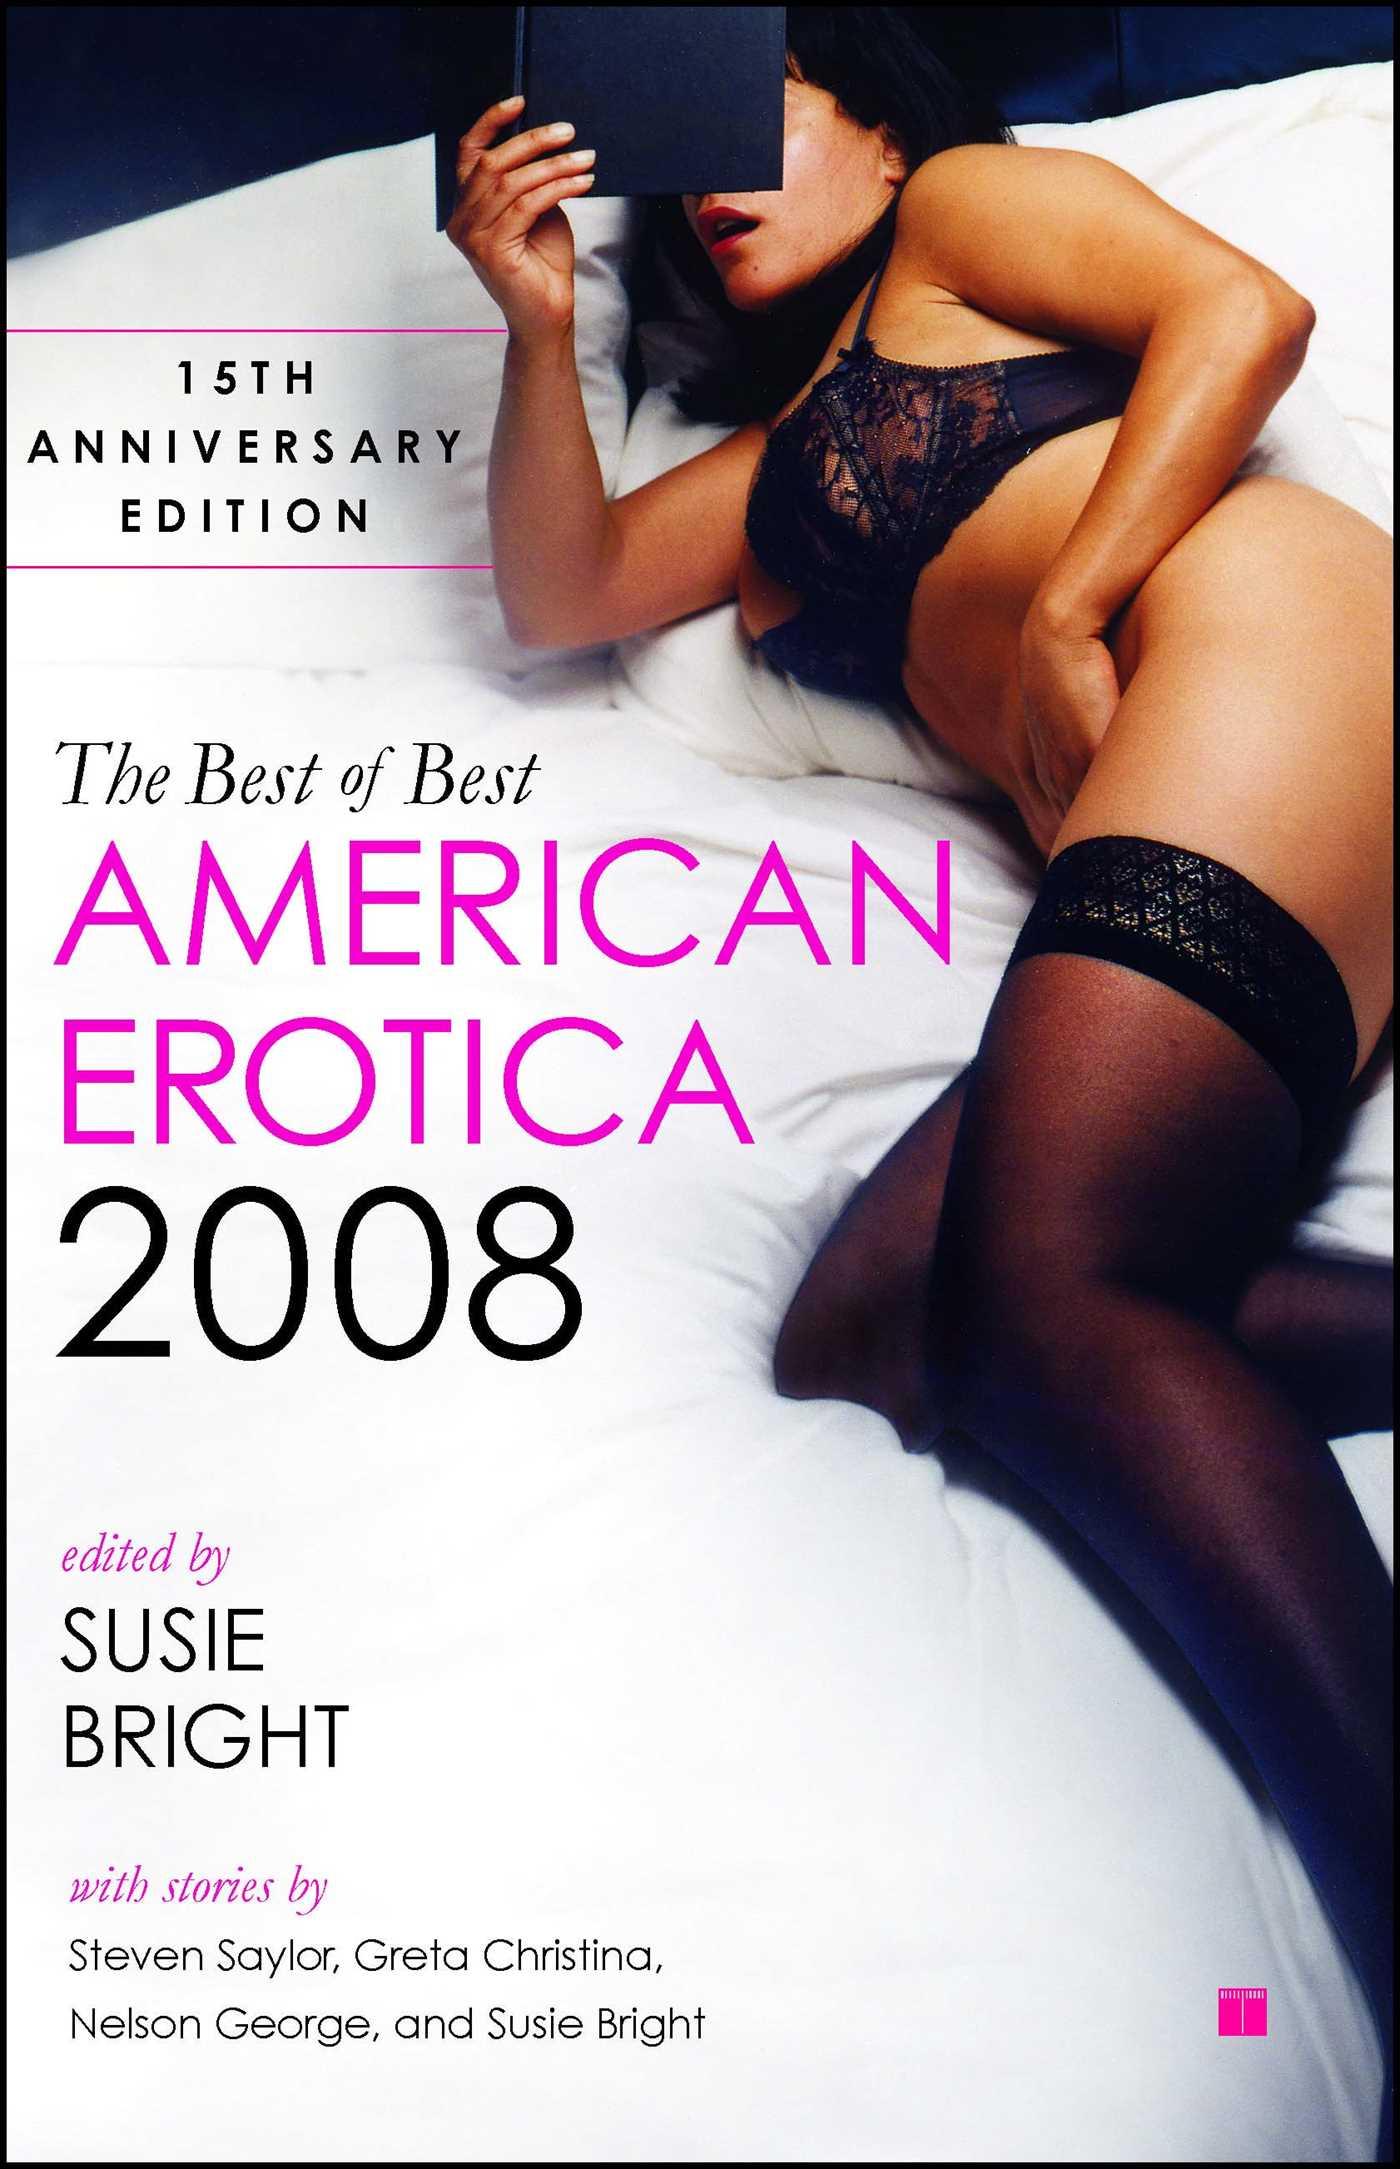 The best of best american erotica 2008 9780743289634 hr